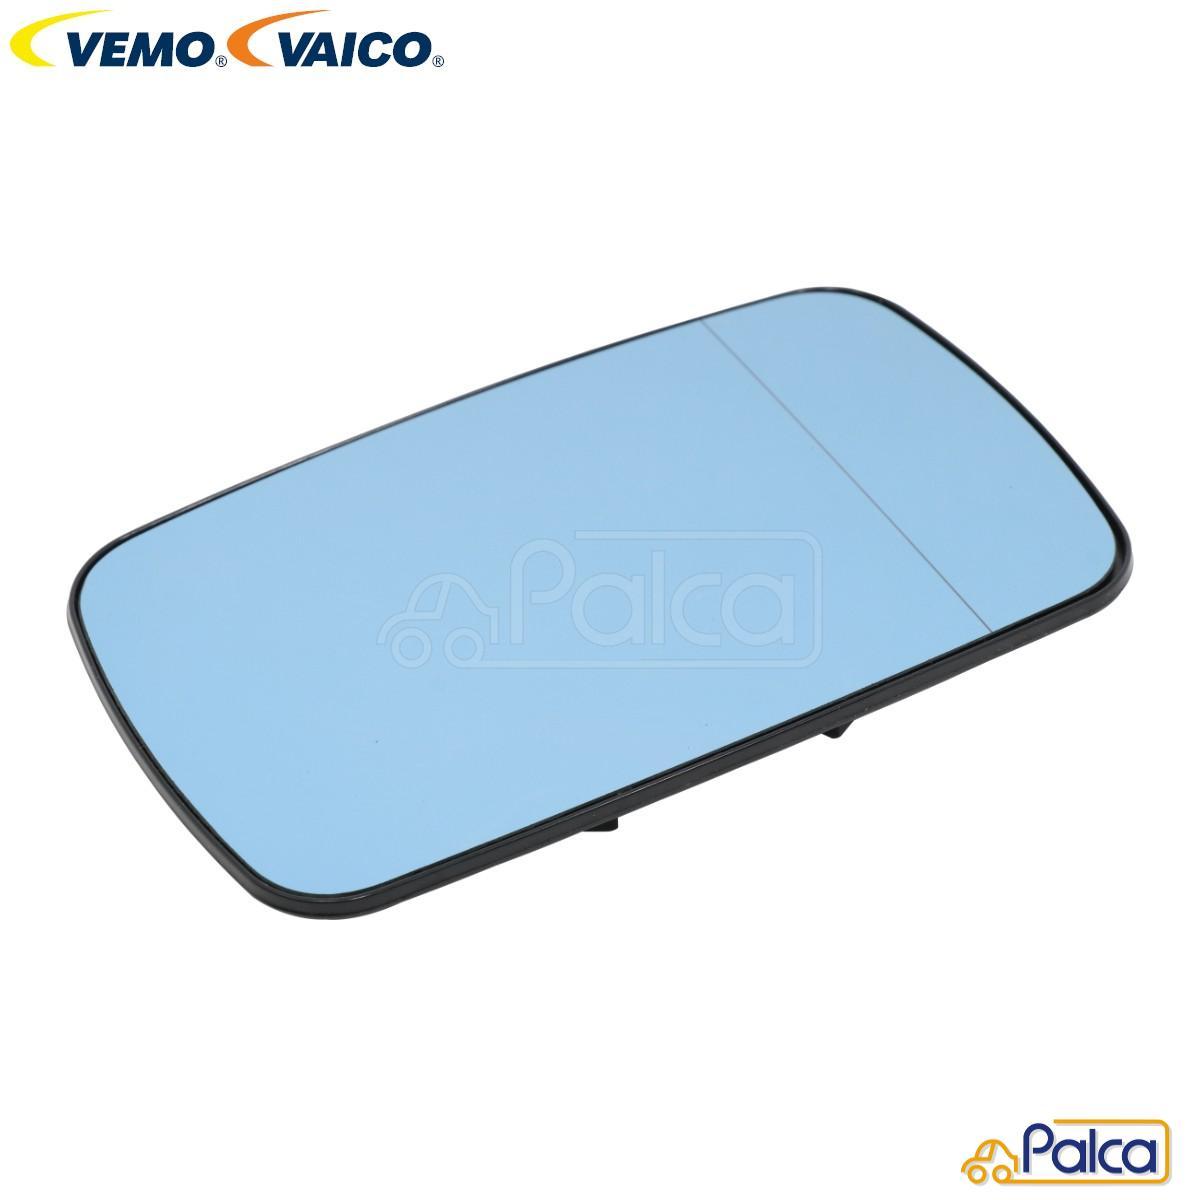 VEMO VAICO製 新品 あす楽 BMW ドアミラーレンズ VEMO製 E46 51168250441 驚きの値段で 3シリーズ 本店 左右共通